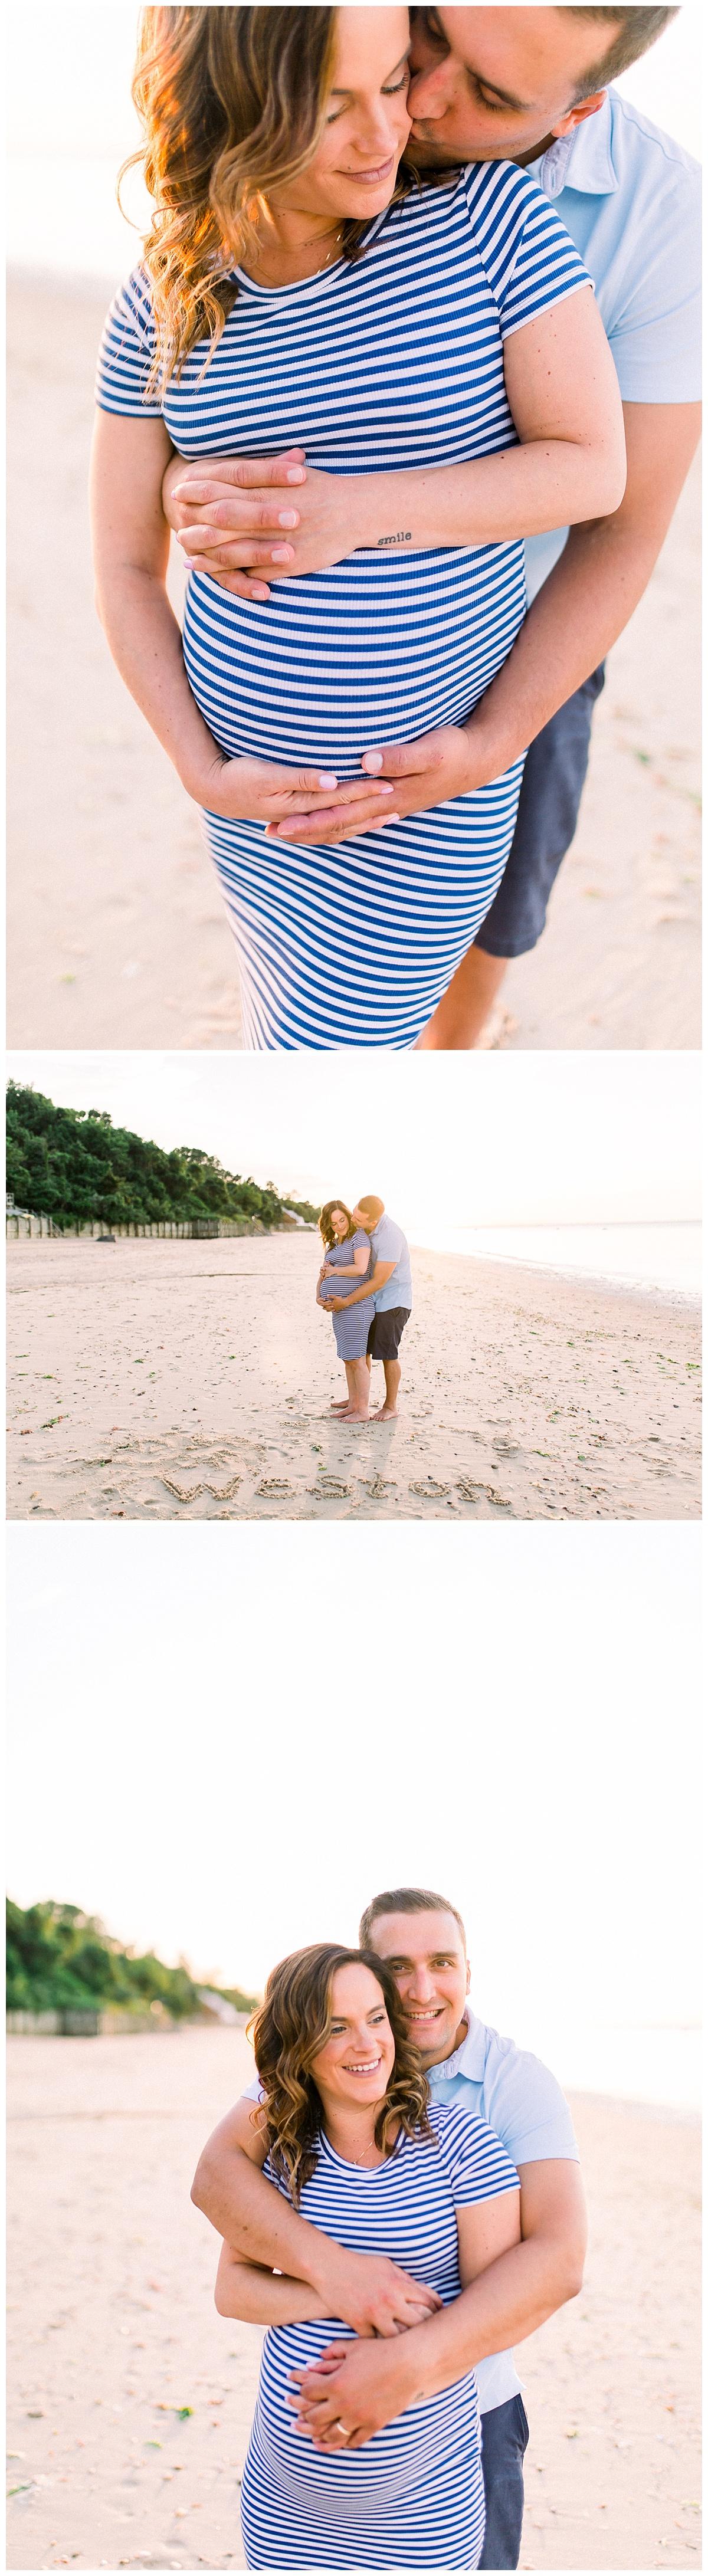 LONG ISLAND Family Photographer_0007.jpg